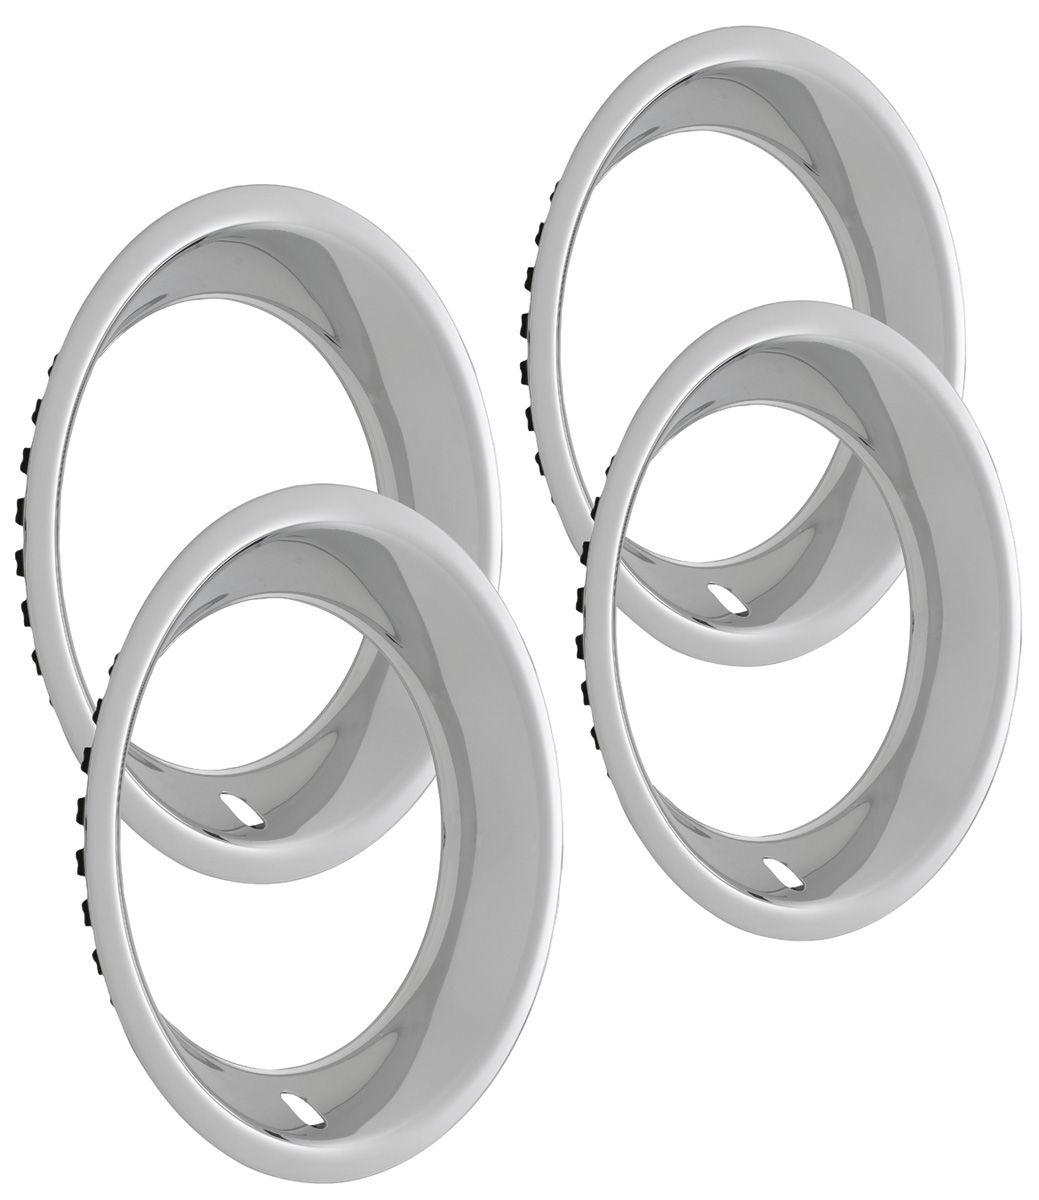 "Photo of Wheel Trim Rings, Reproduction Rally 15"" x 7"" (round lip, 2-3/8"" deep)"